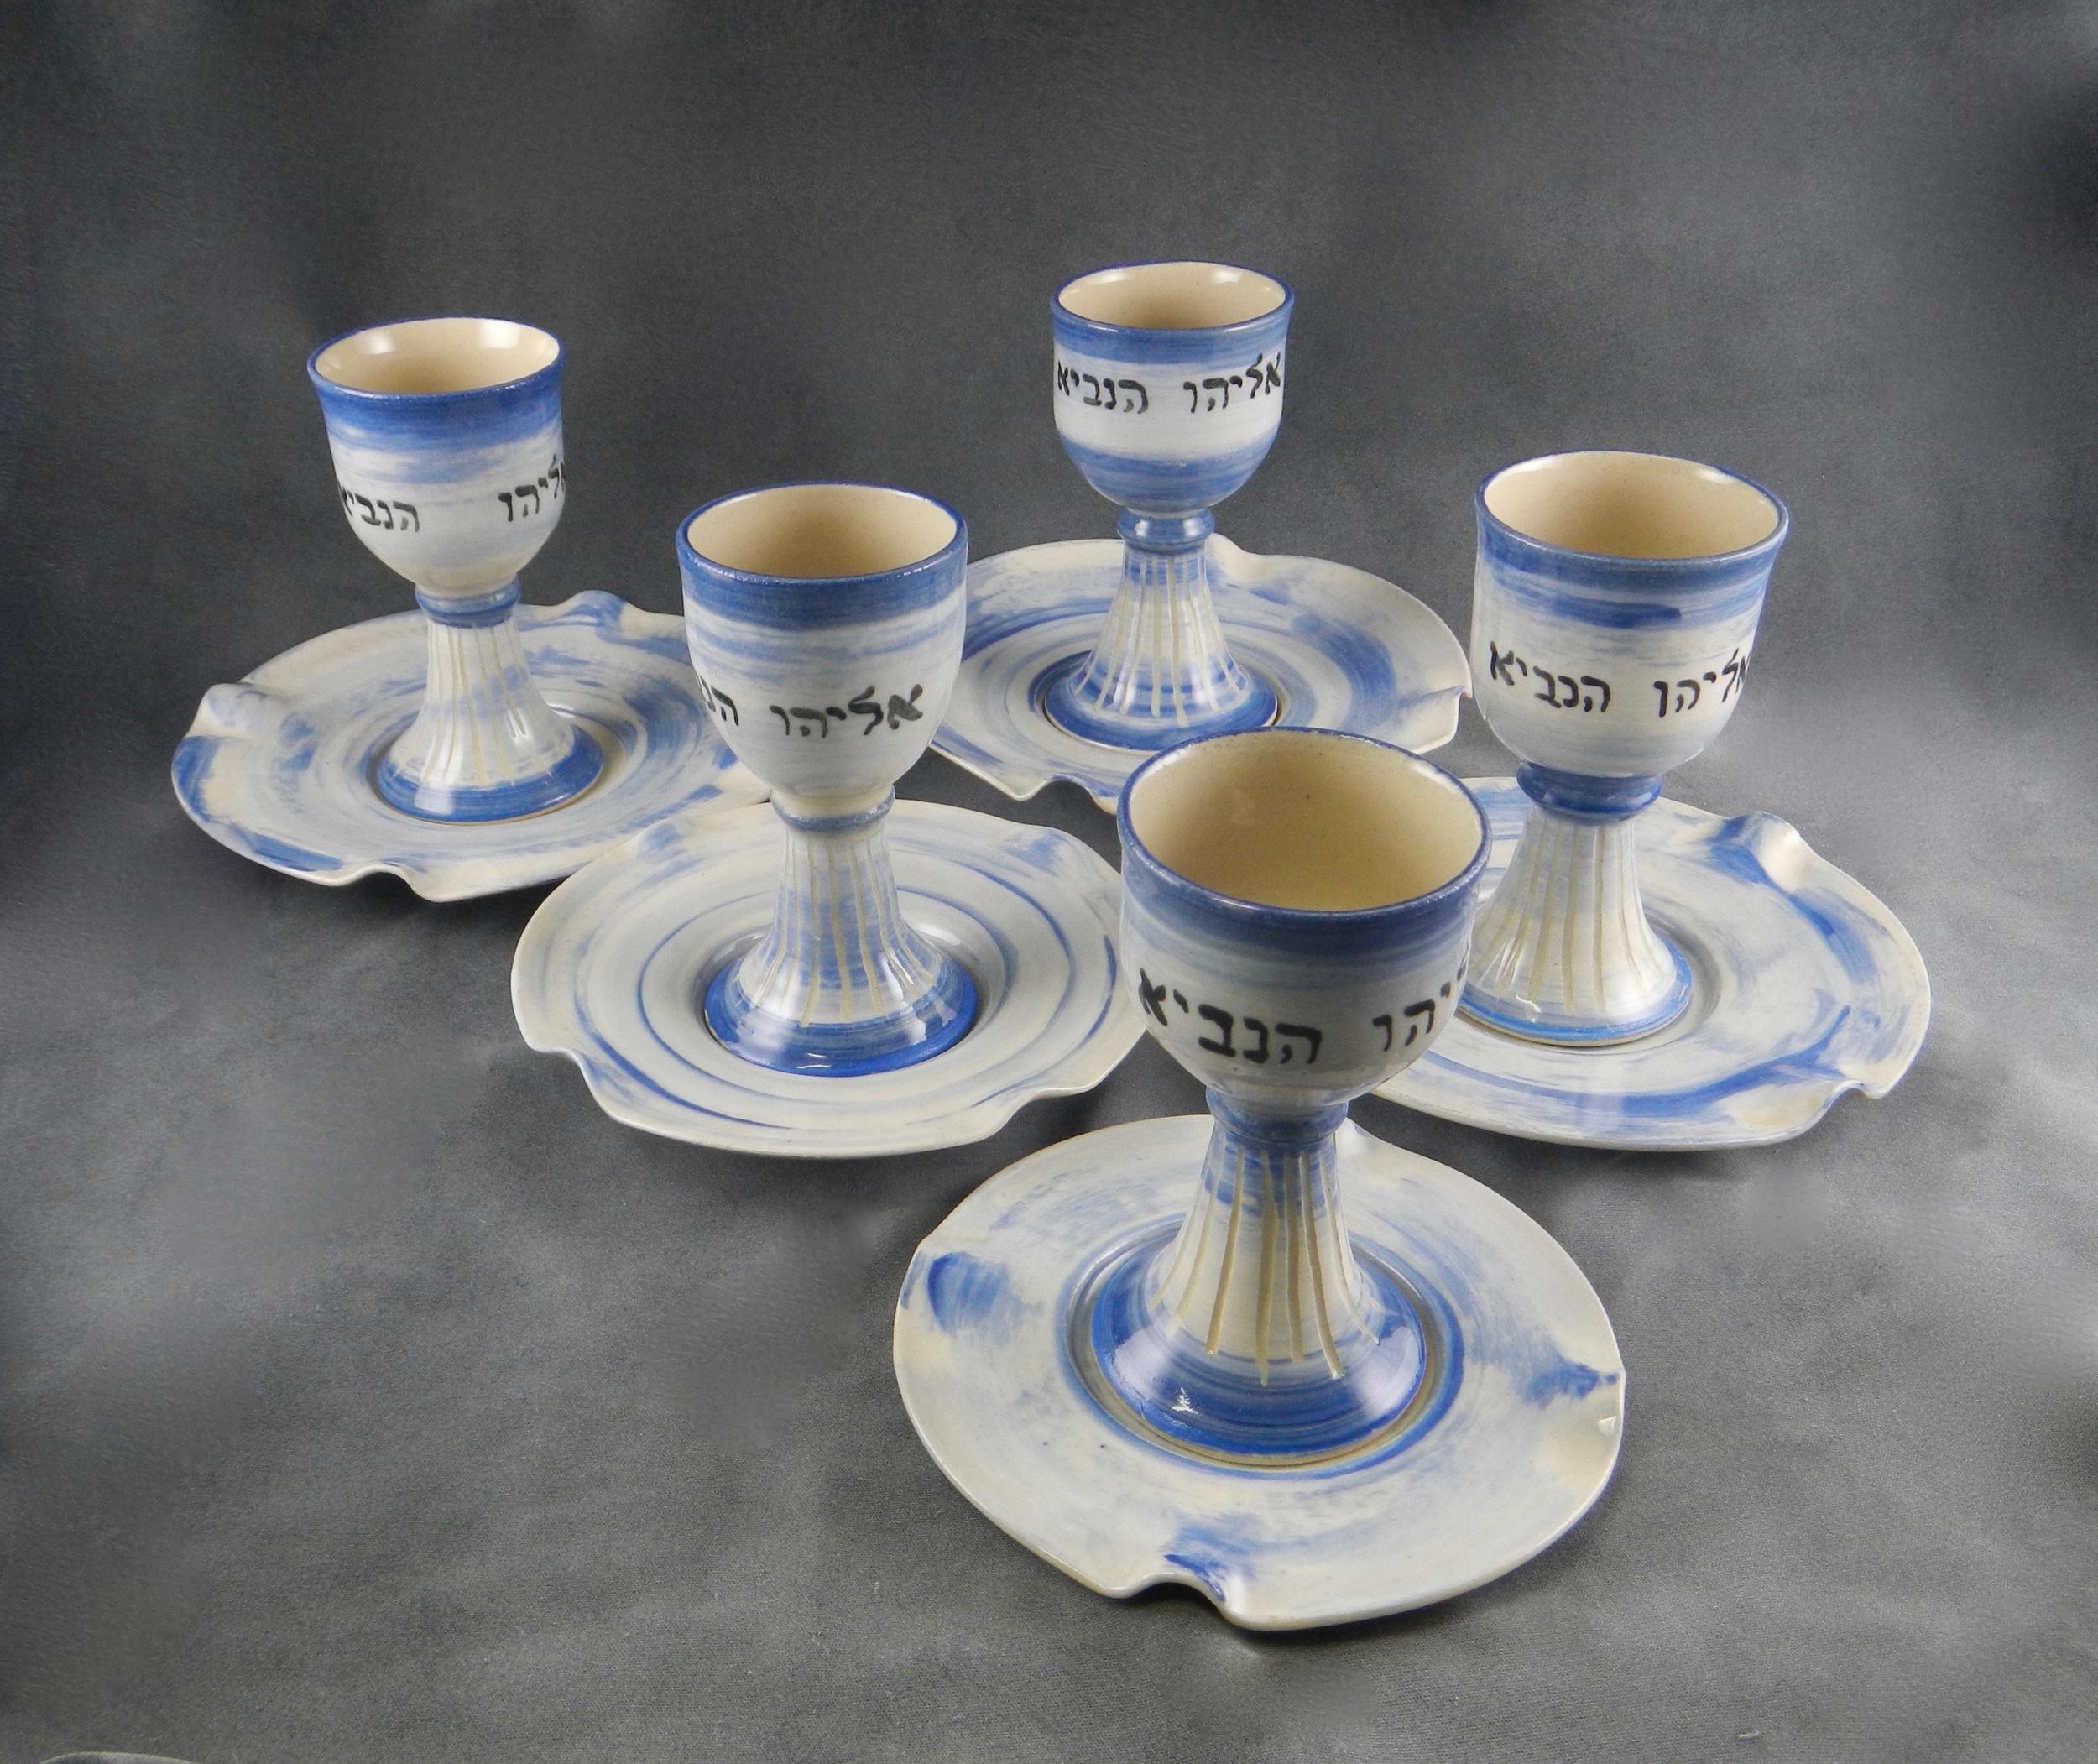 (Elijah's Cups, Mimi Stadler Pottery 2016. Photo Mimi Stadler)